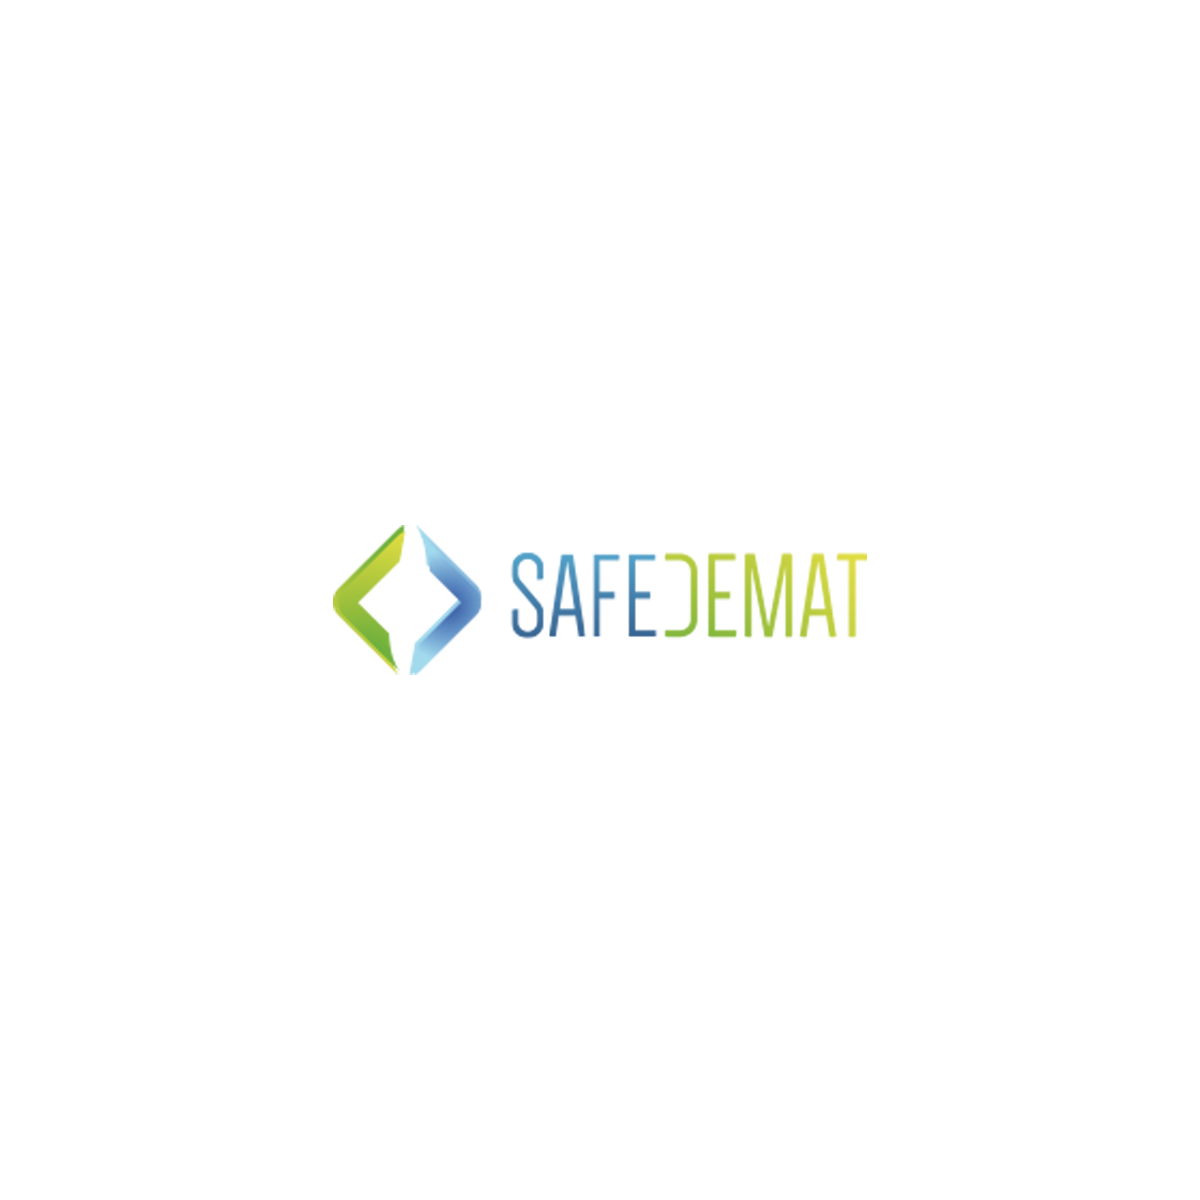 Safedemat